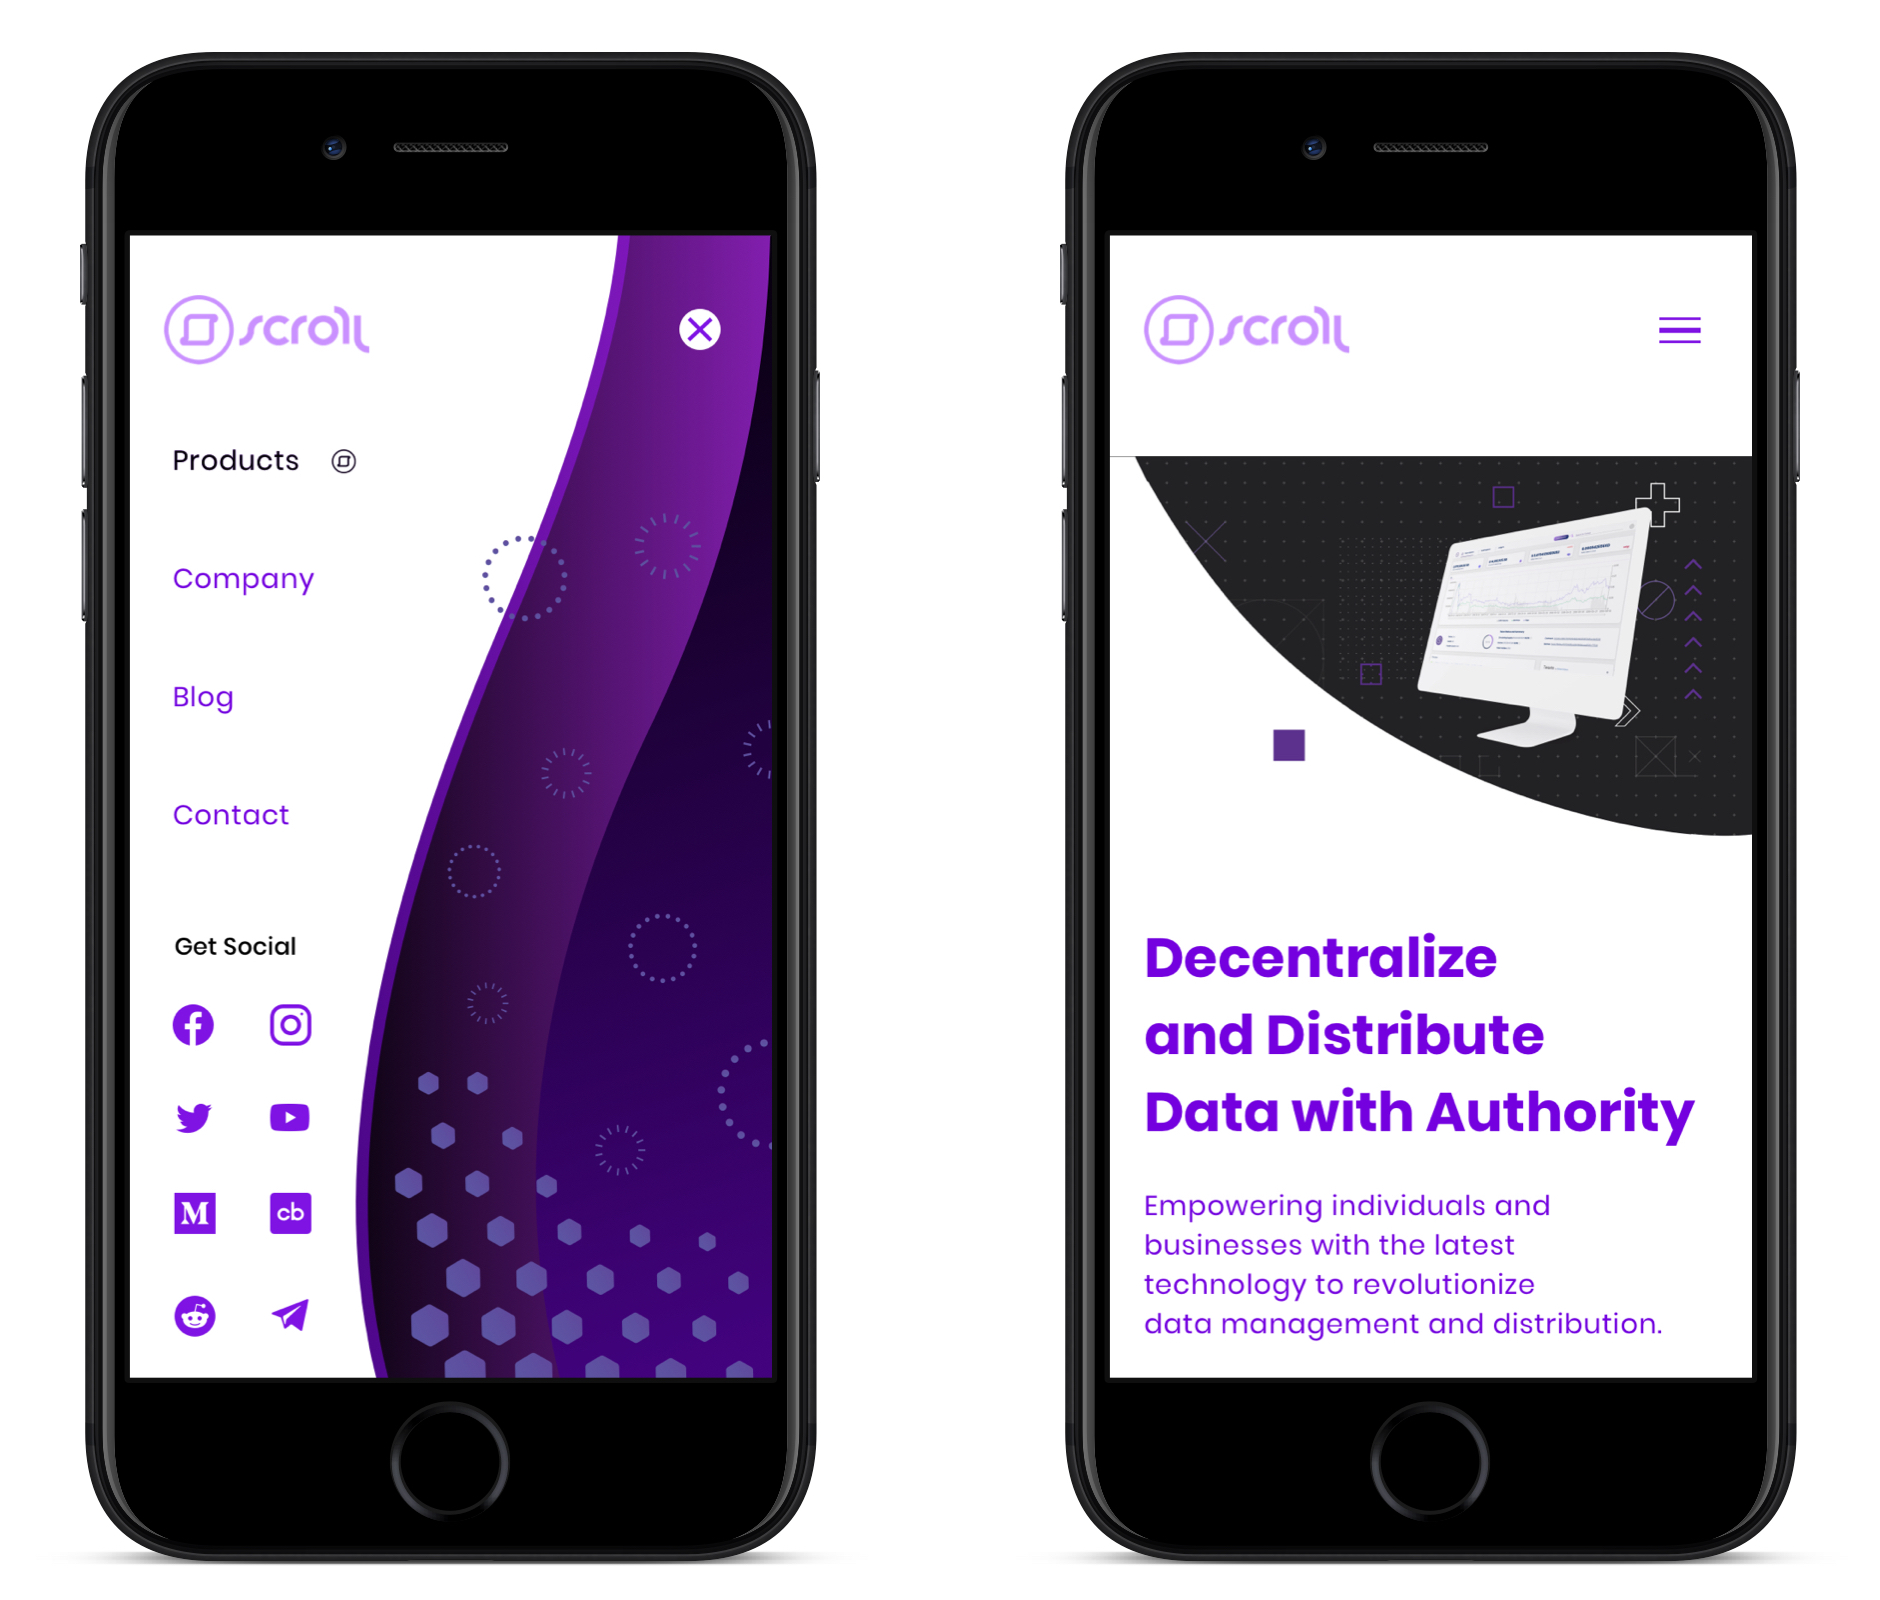 scroll-menu-mobile-mockup-image